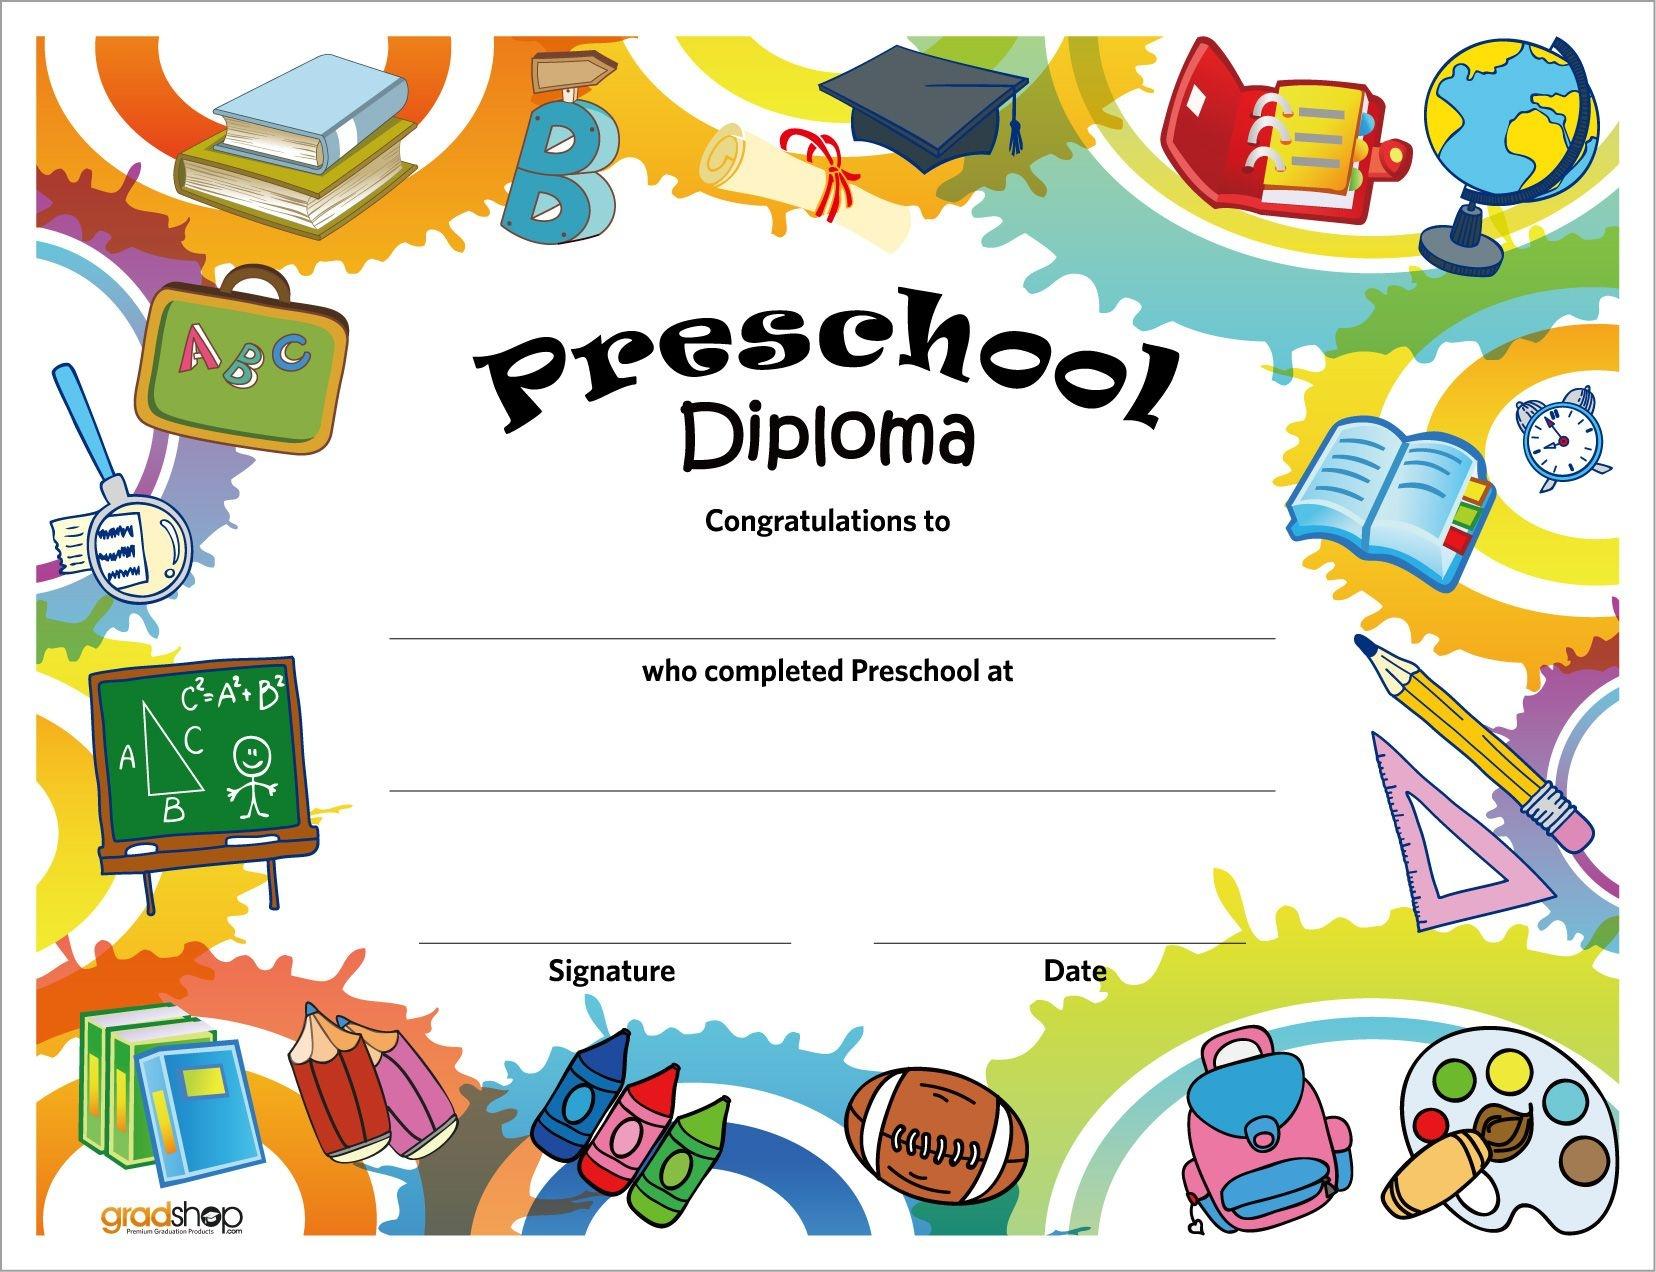 Free Printable Preschool Diplomas | Preschool Classroom | Graduation - Free Printable Preschool Diplomas